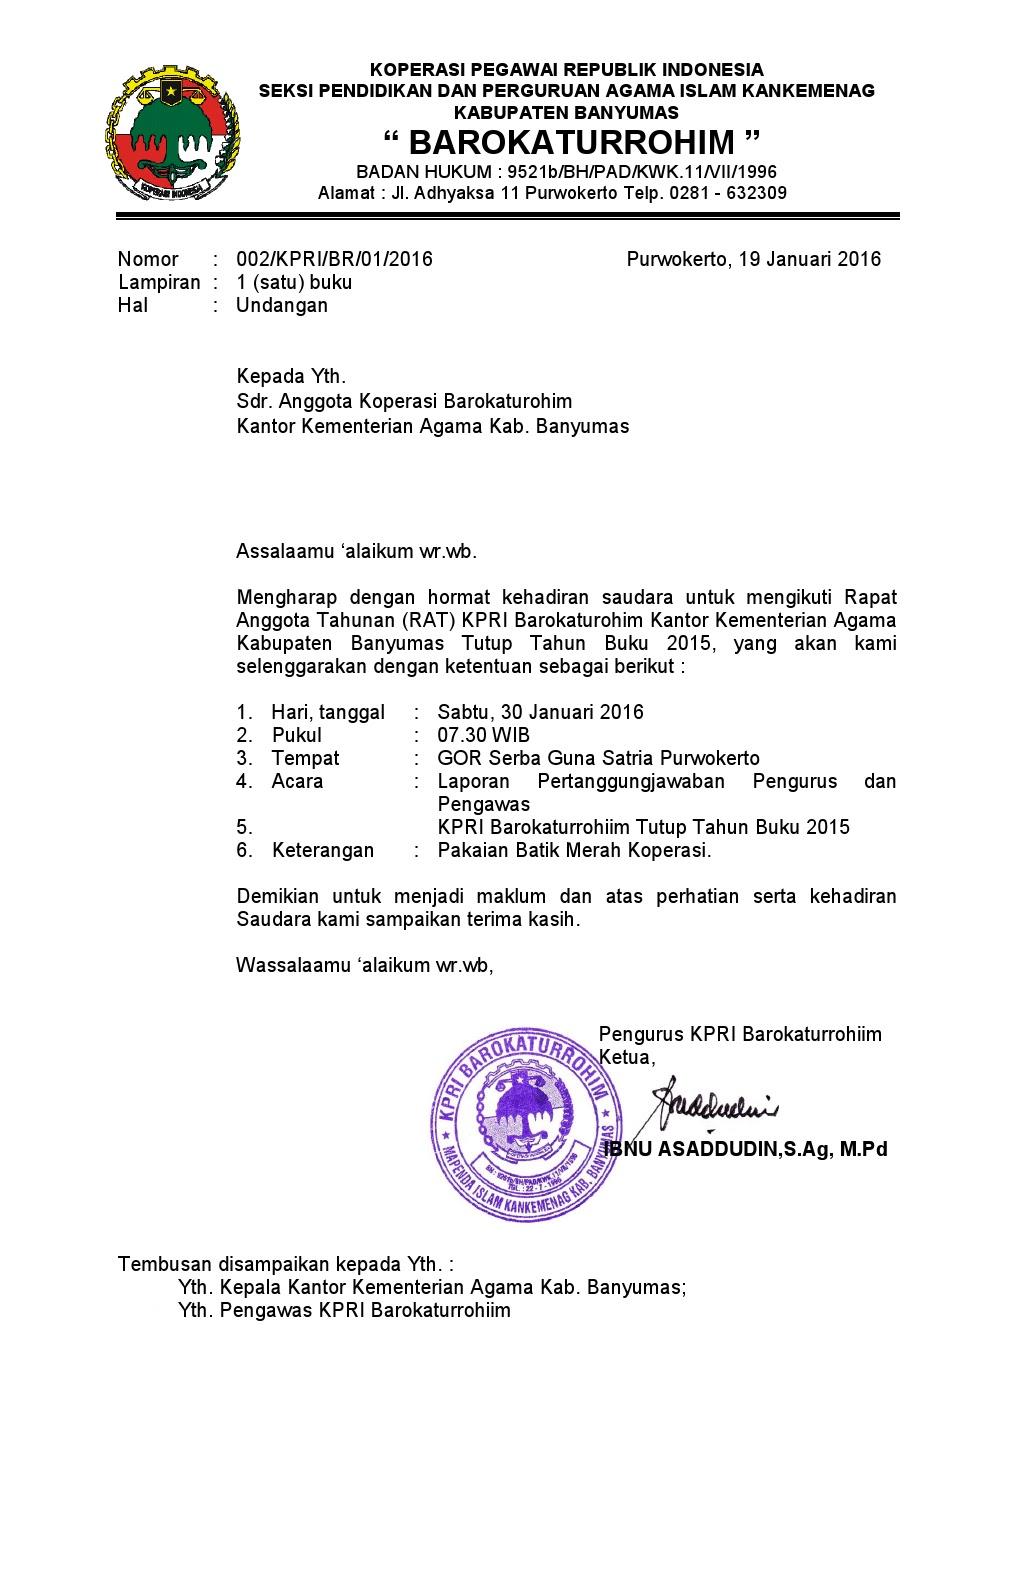 Contoh Surat Undangan Rapat Anggota Koperasi